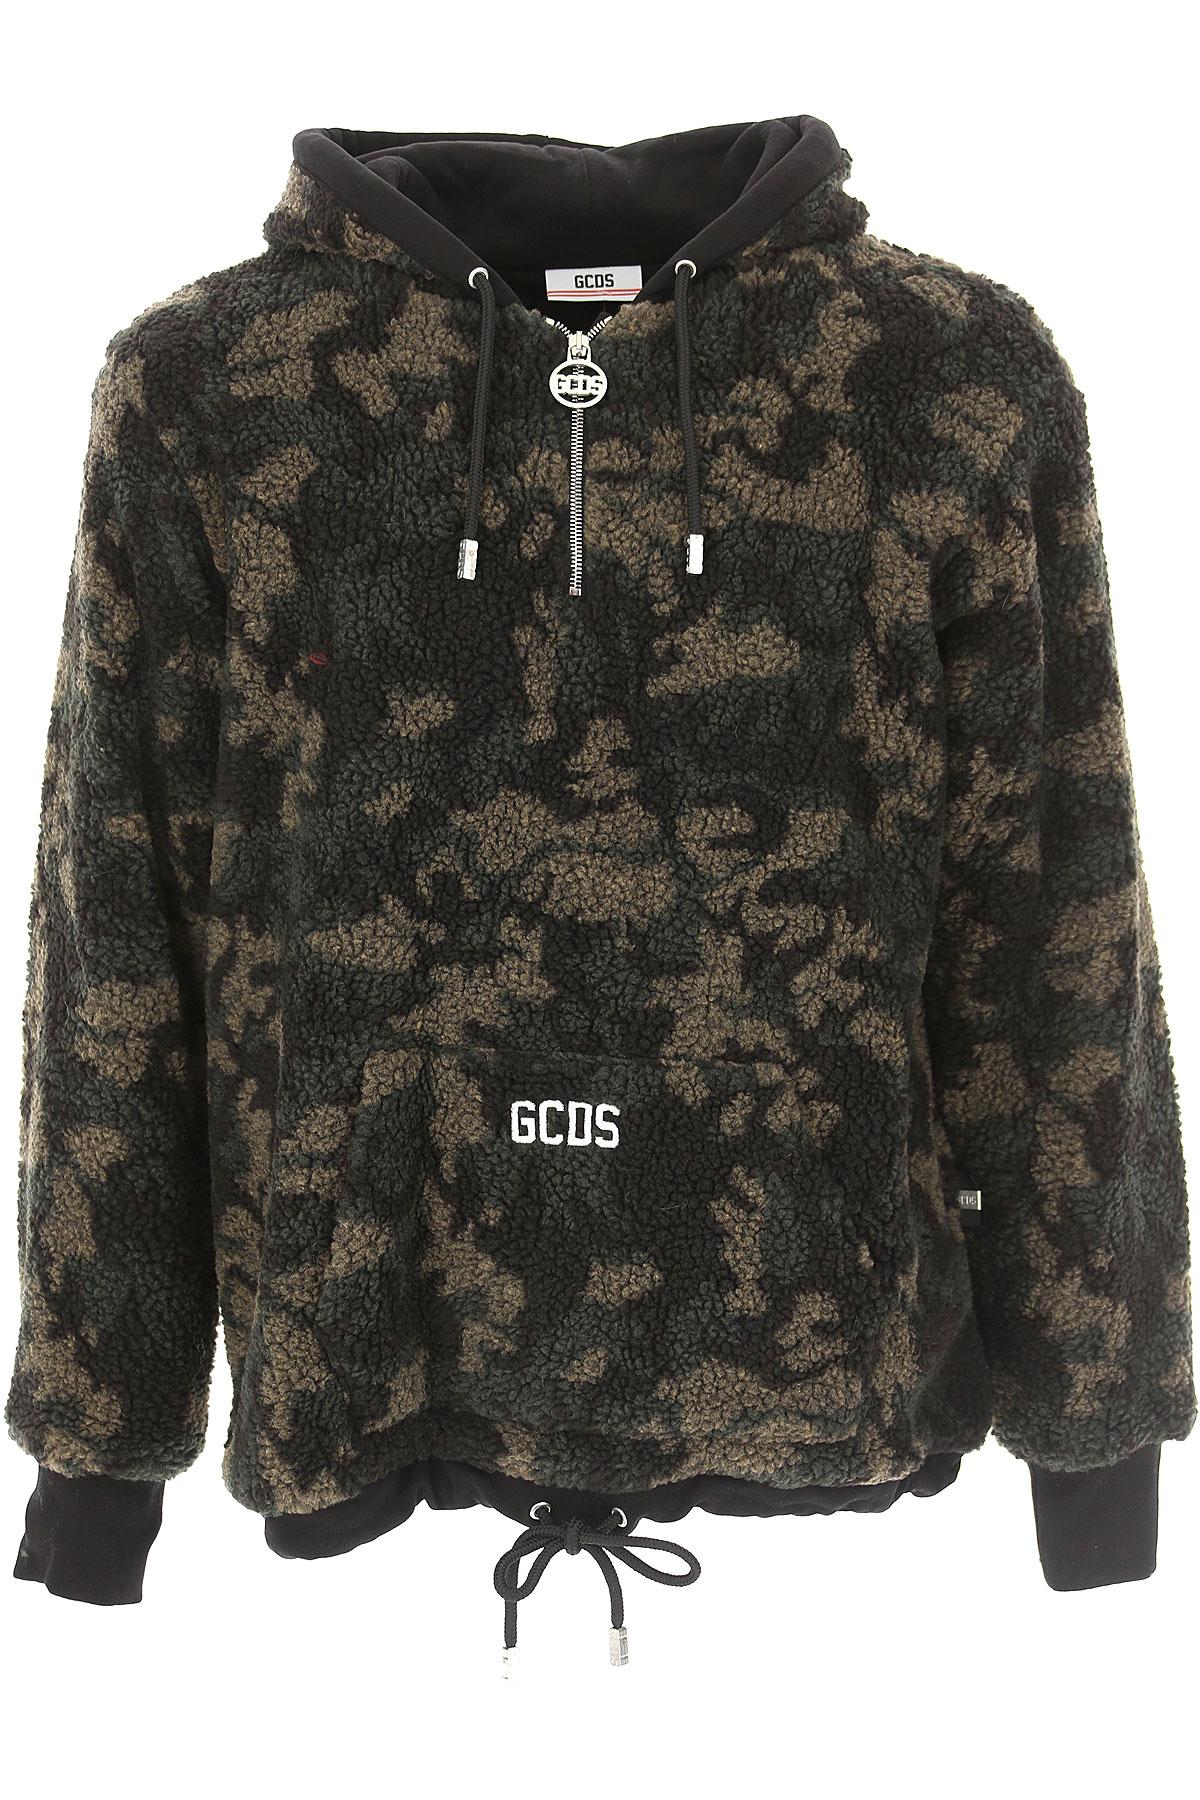 Image of GCDS Jacket for Men, Black, polyester, 2017, L M S XL